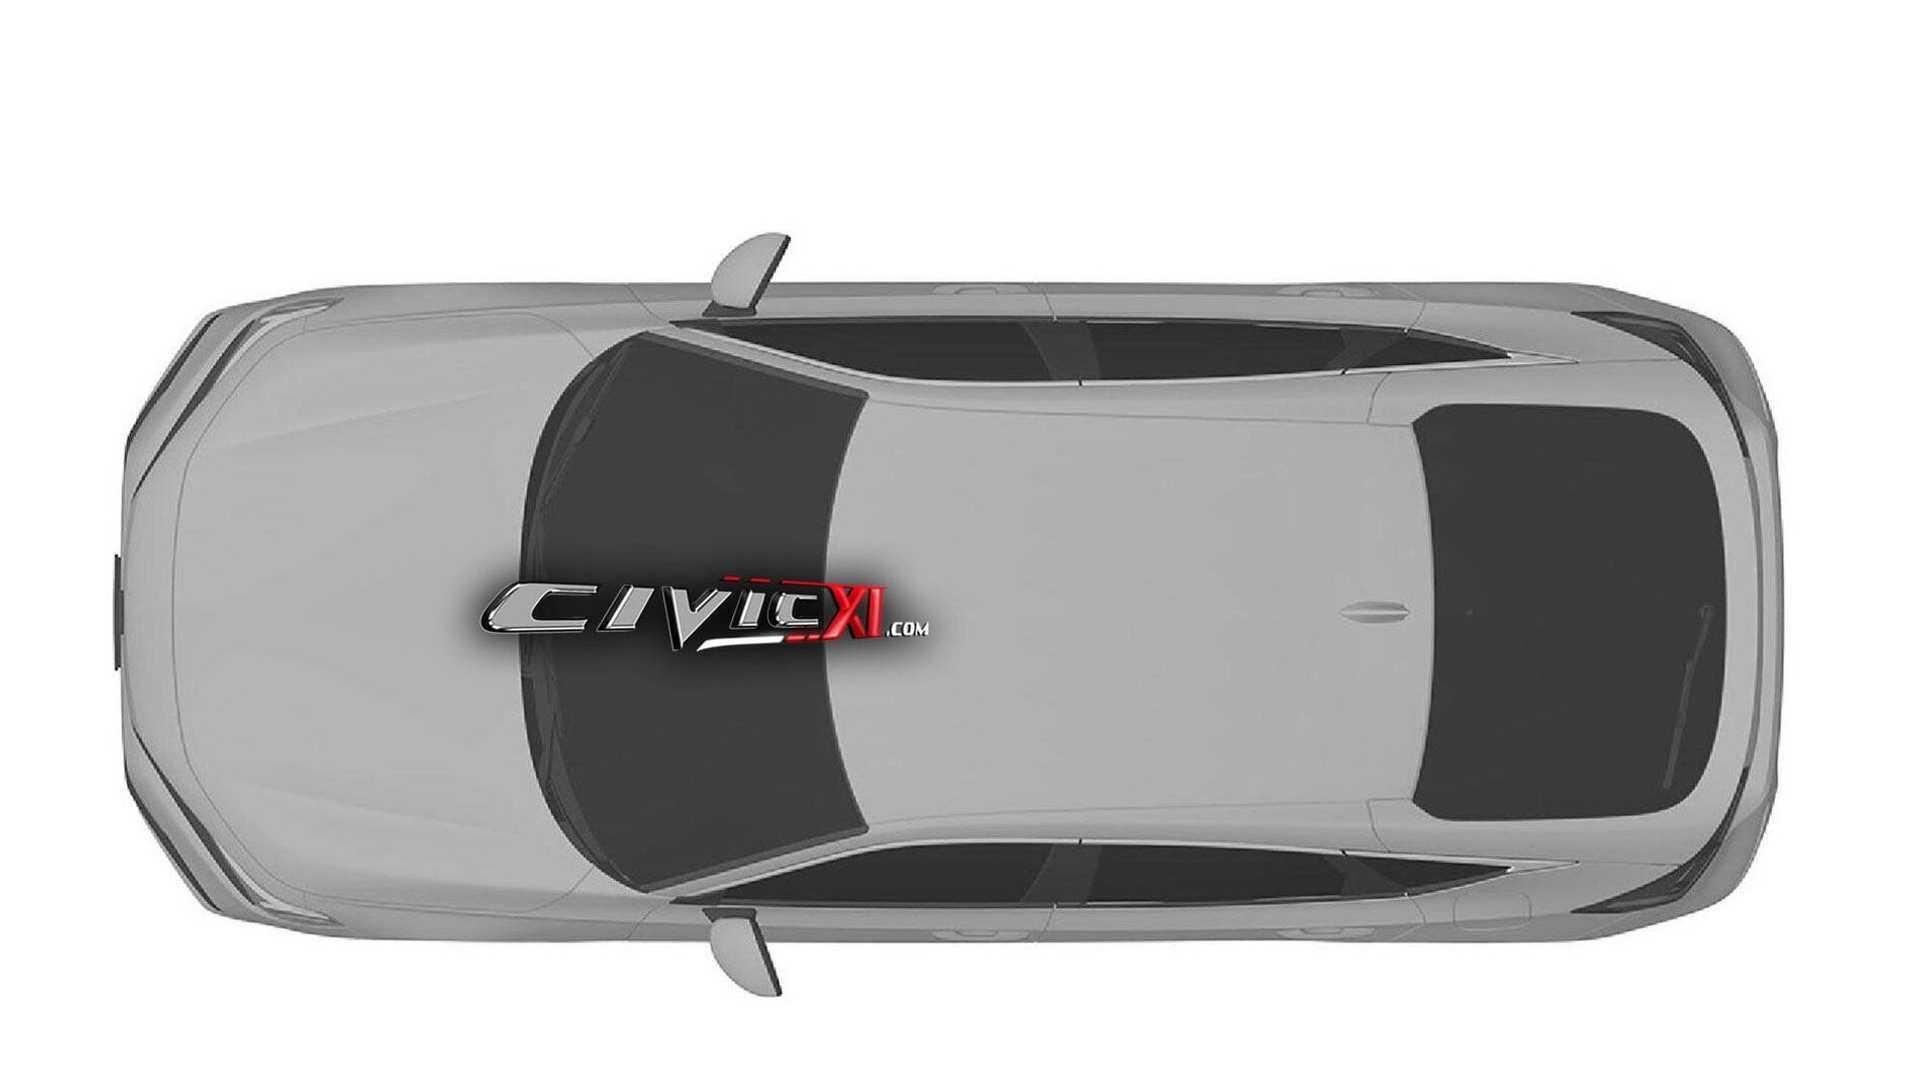 honda-civic-11th-generation-design-trademark-roof